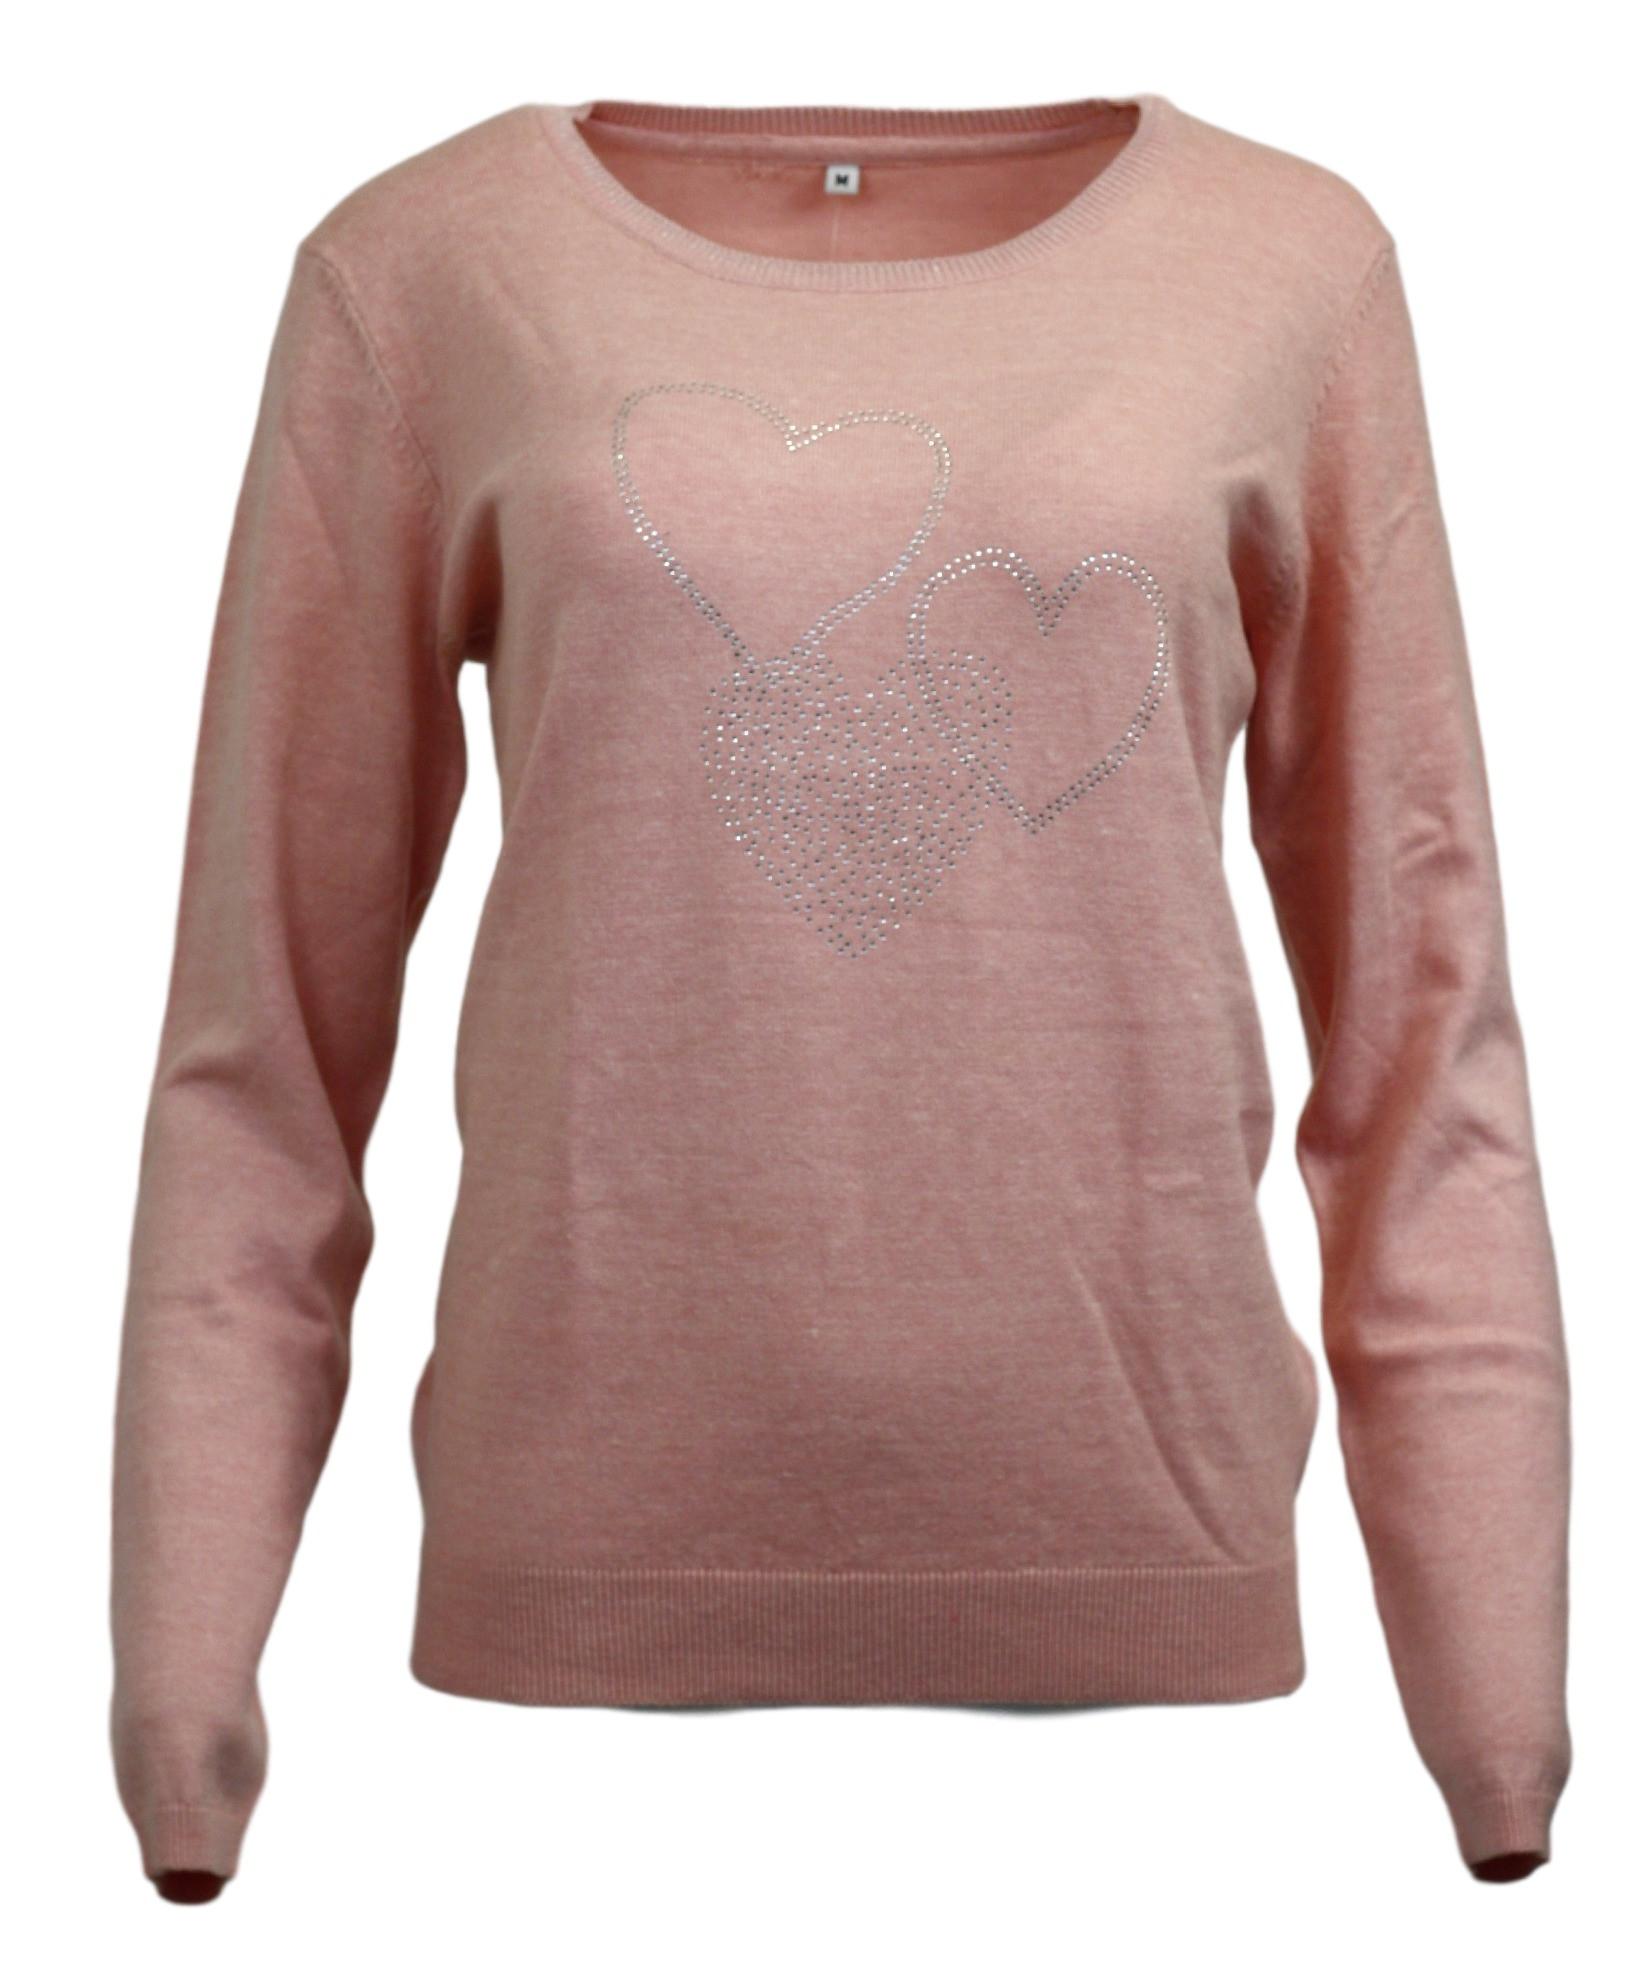 Dámský svetřík - Rhodos - Hegler Barva: růžová, Velikost: L